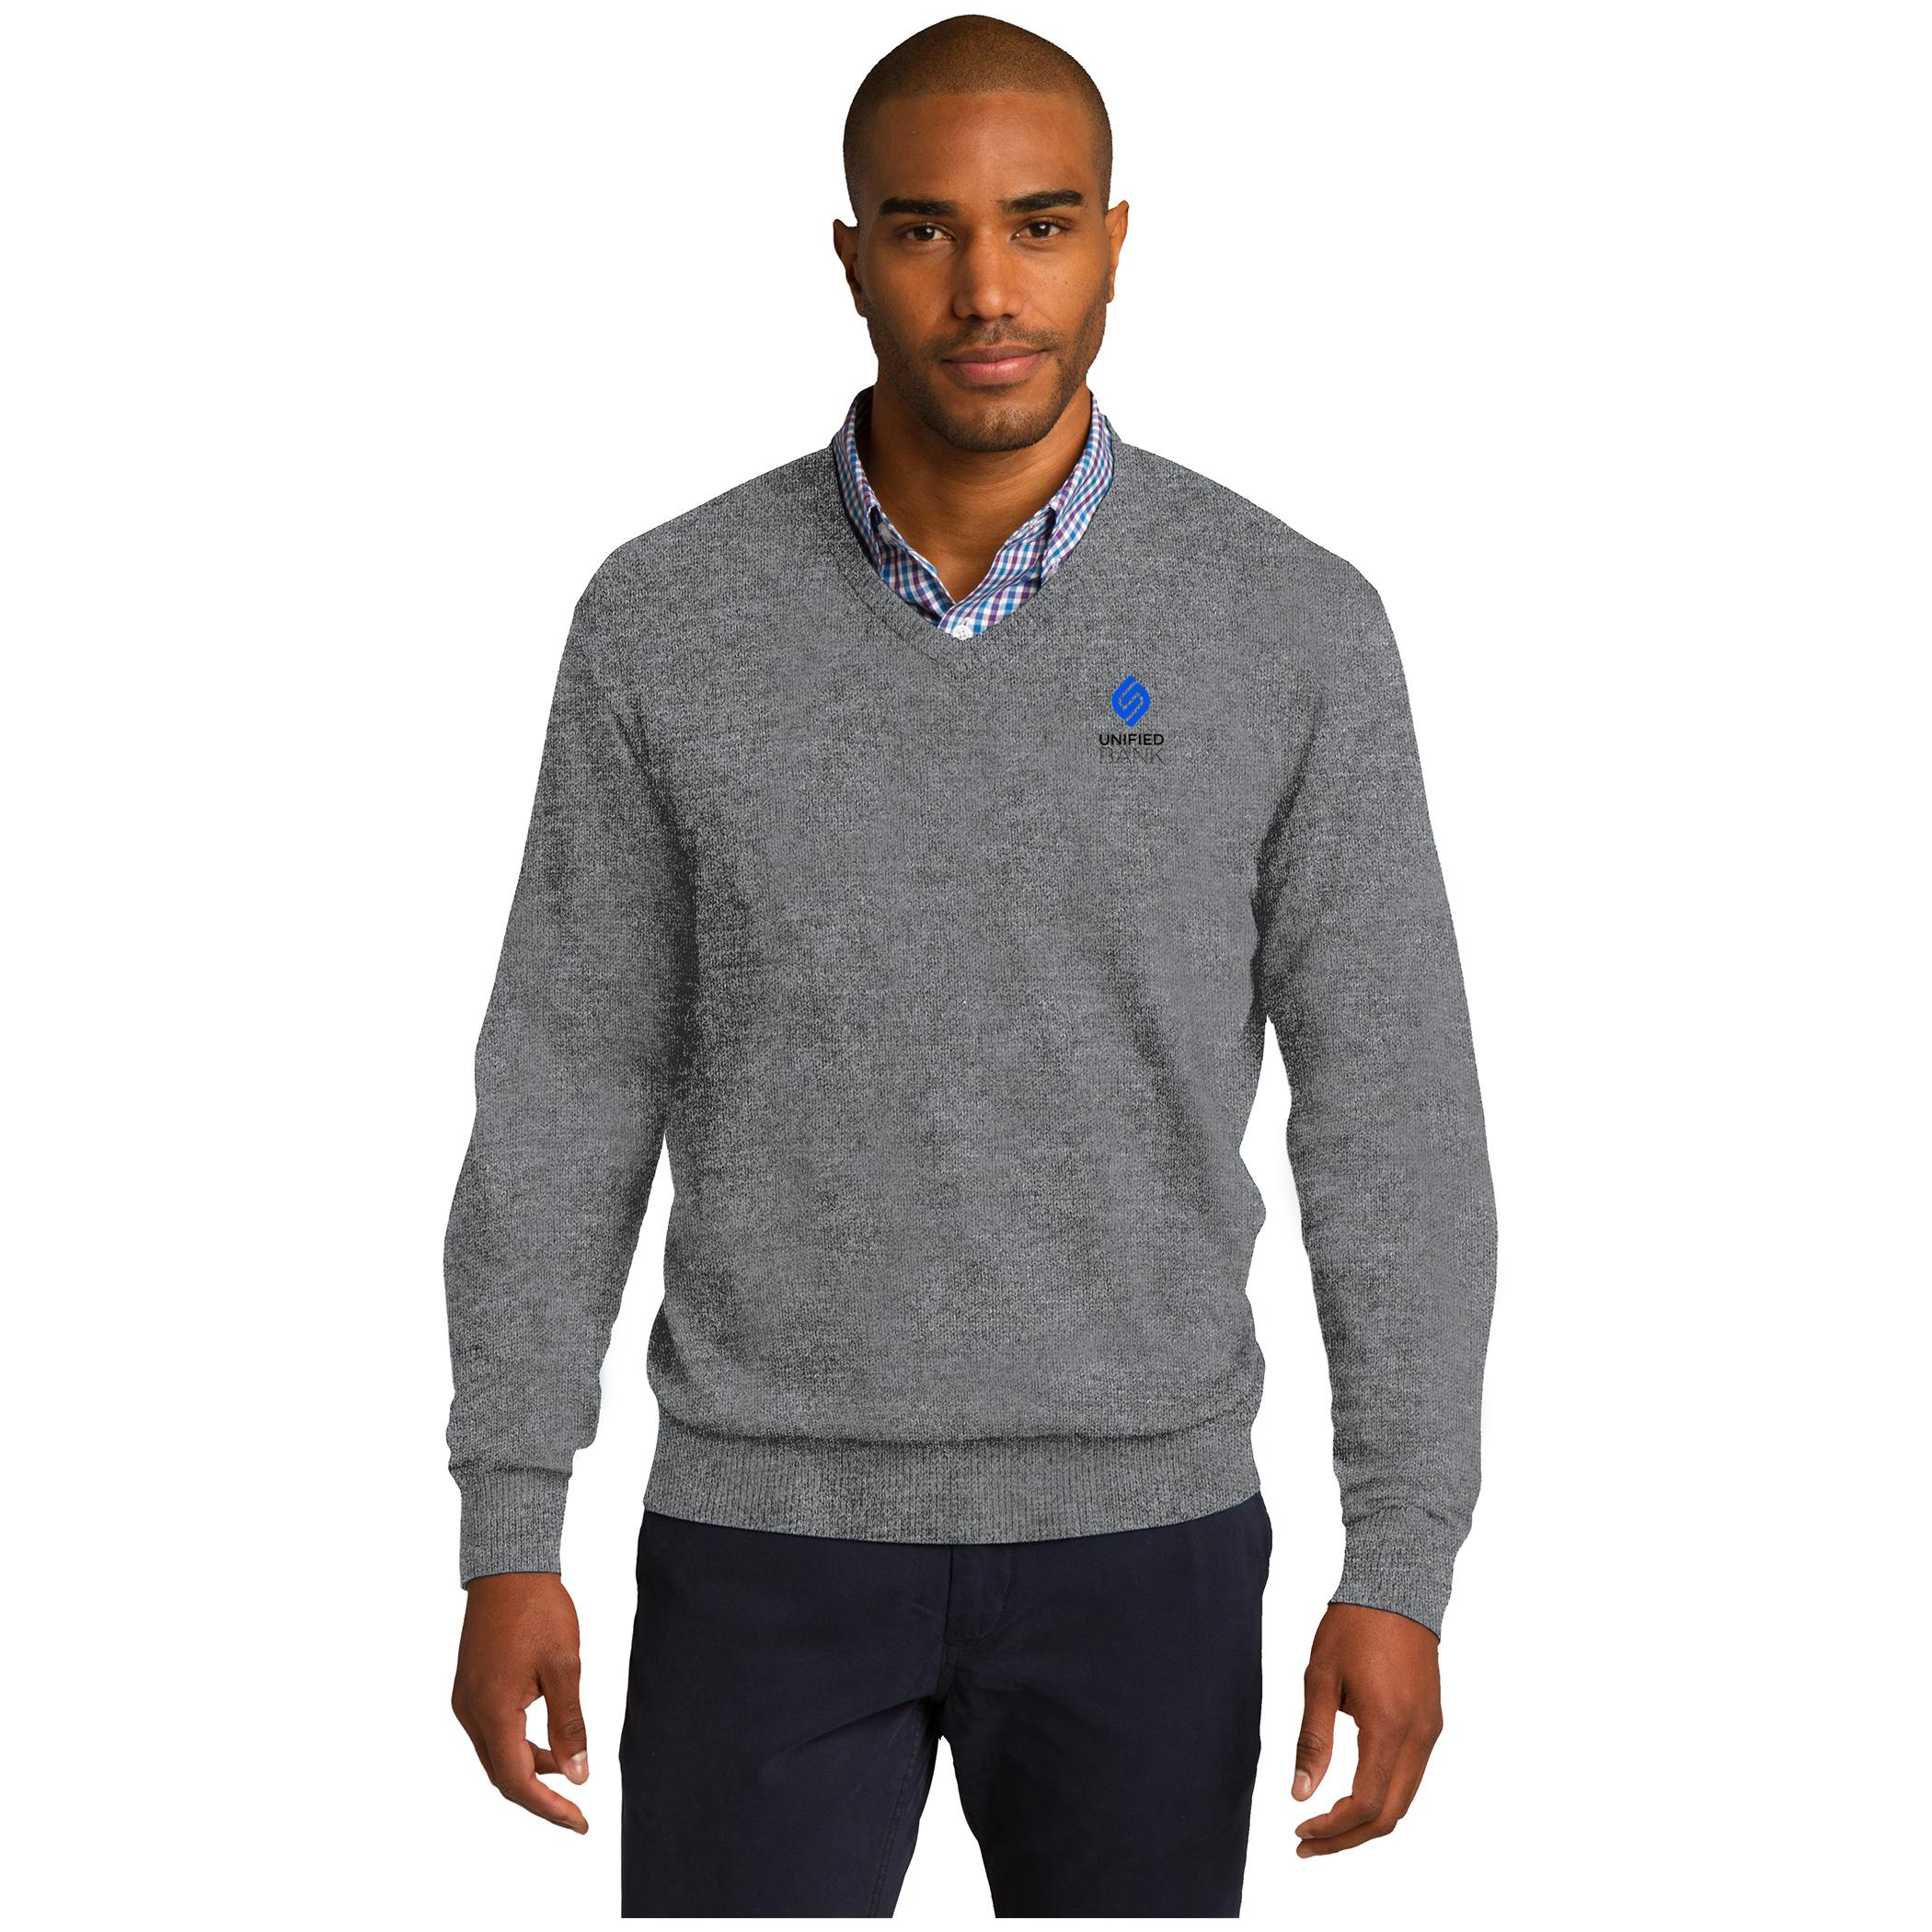 Mens/Unisex Grey V Neck Sweater